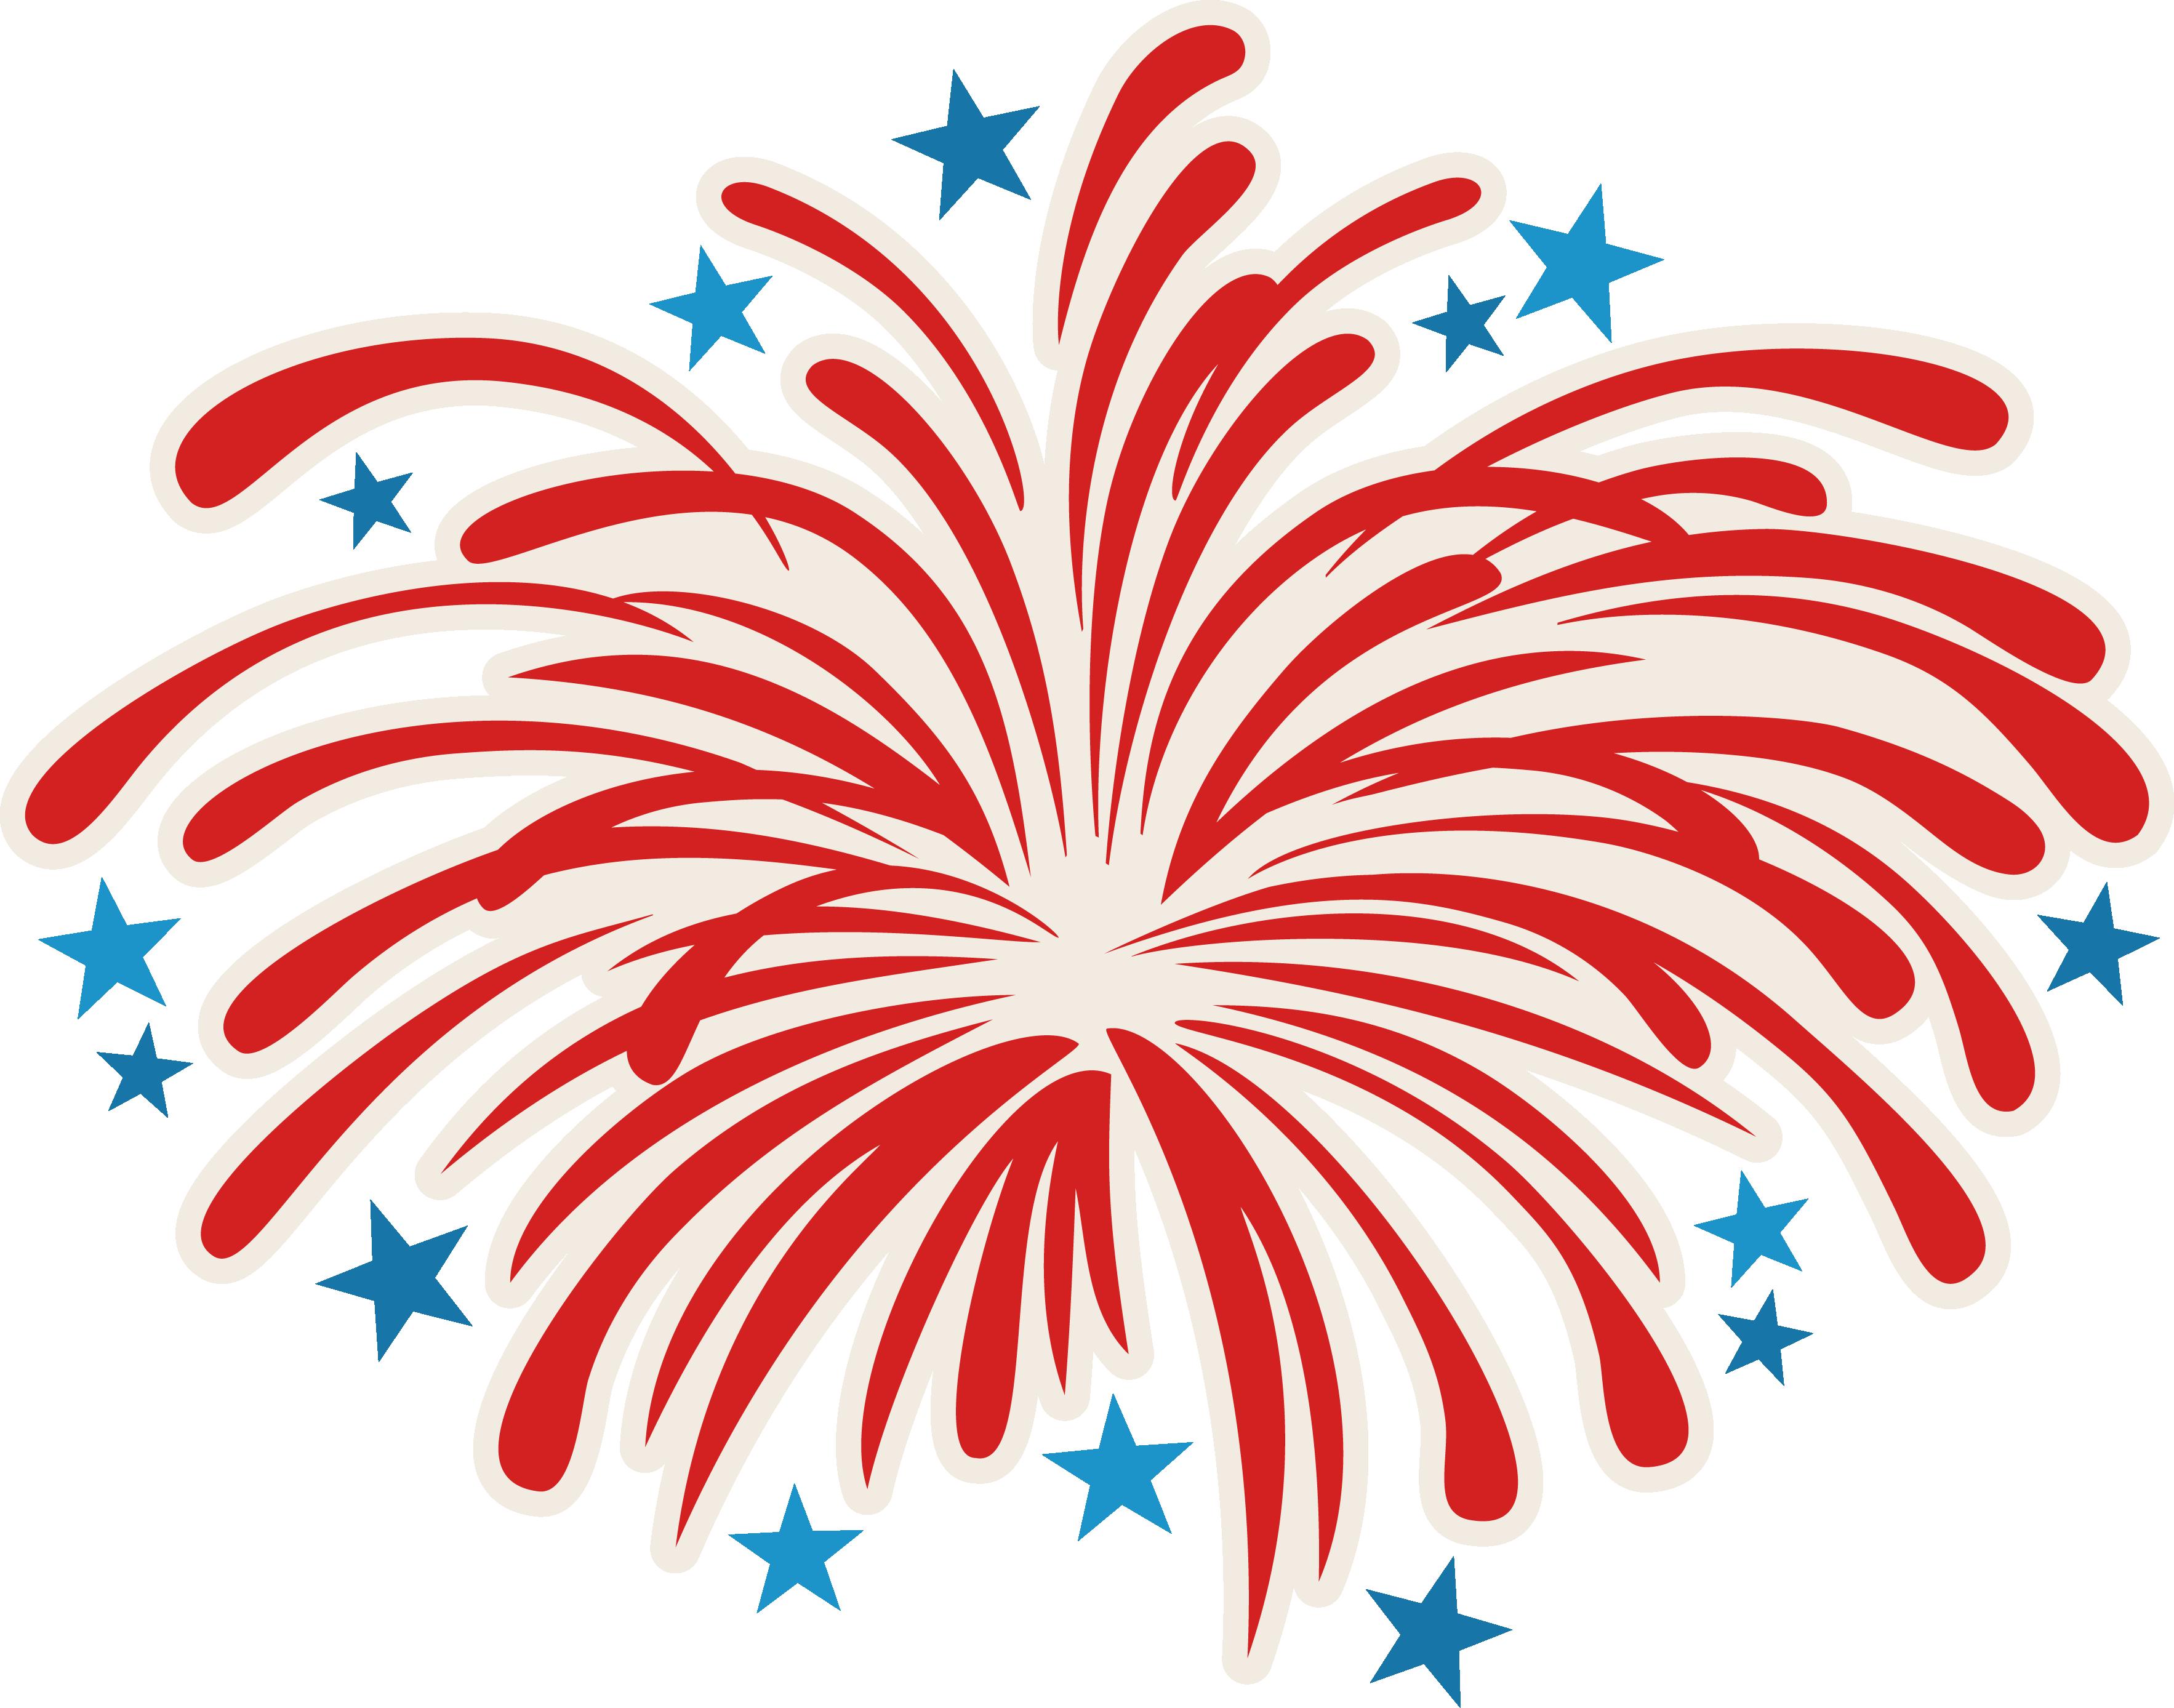 png royalty free download Firework blast svg s. Fireworks clipart